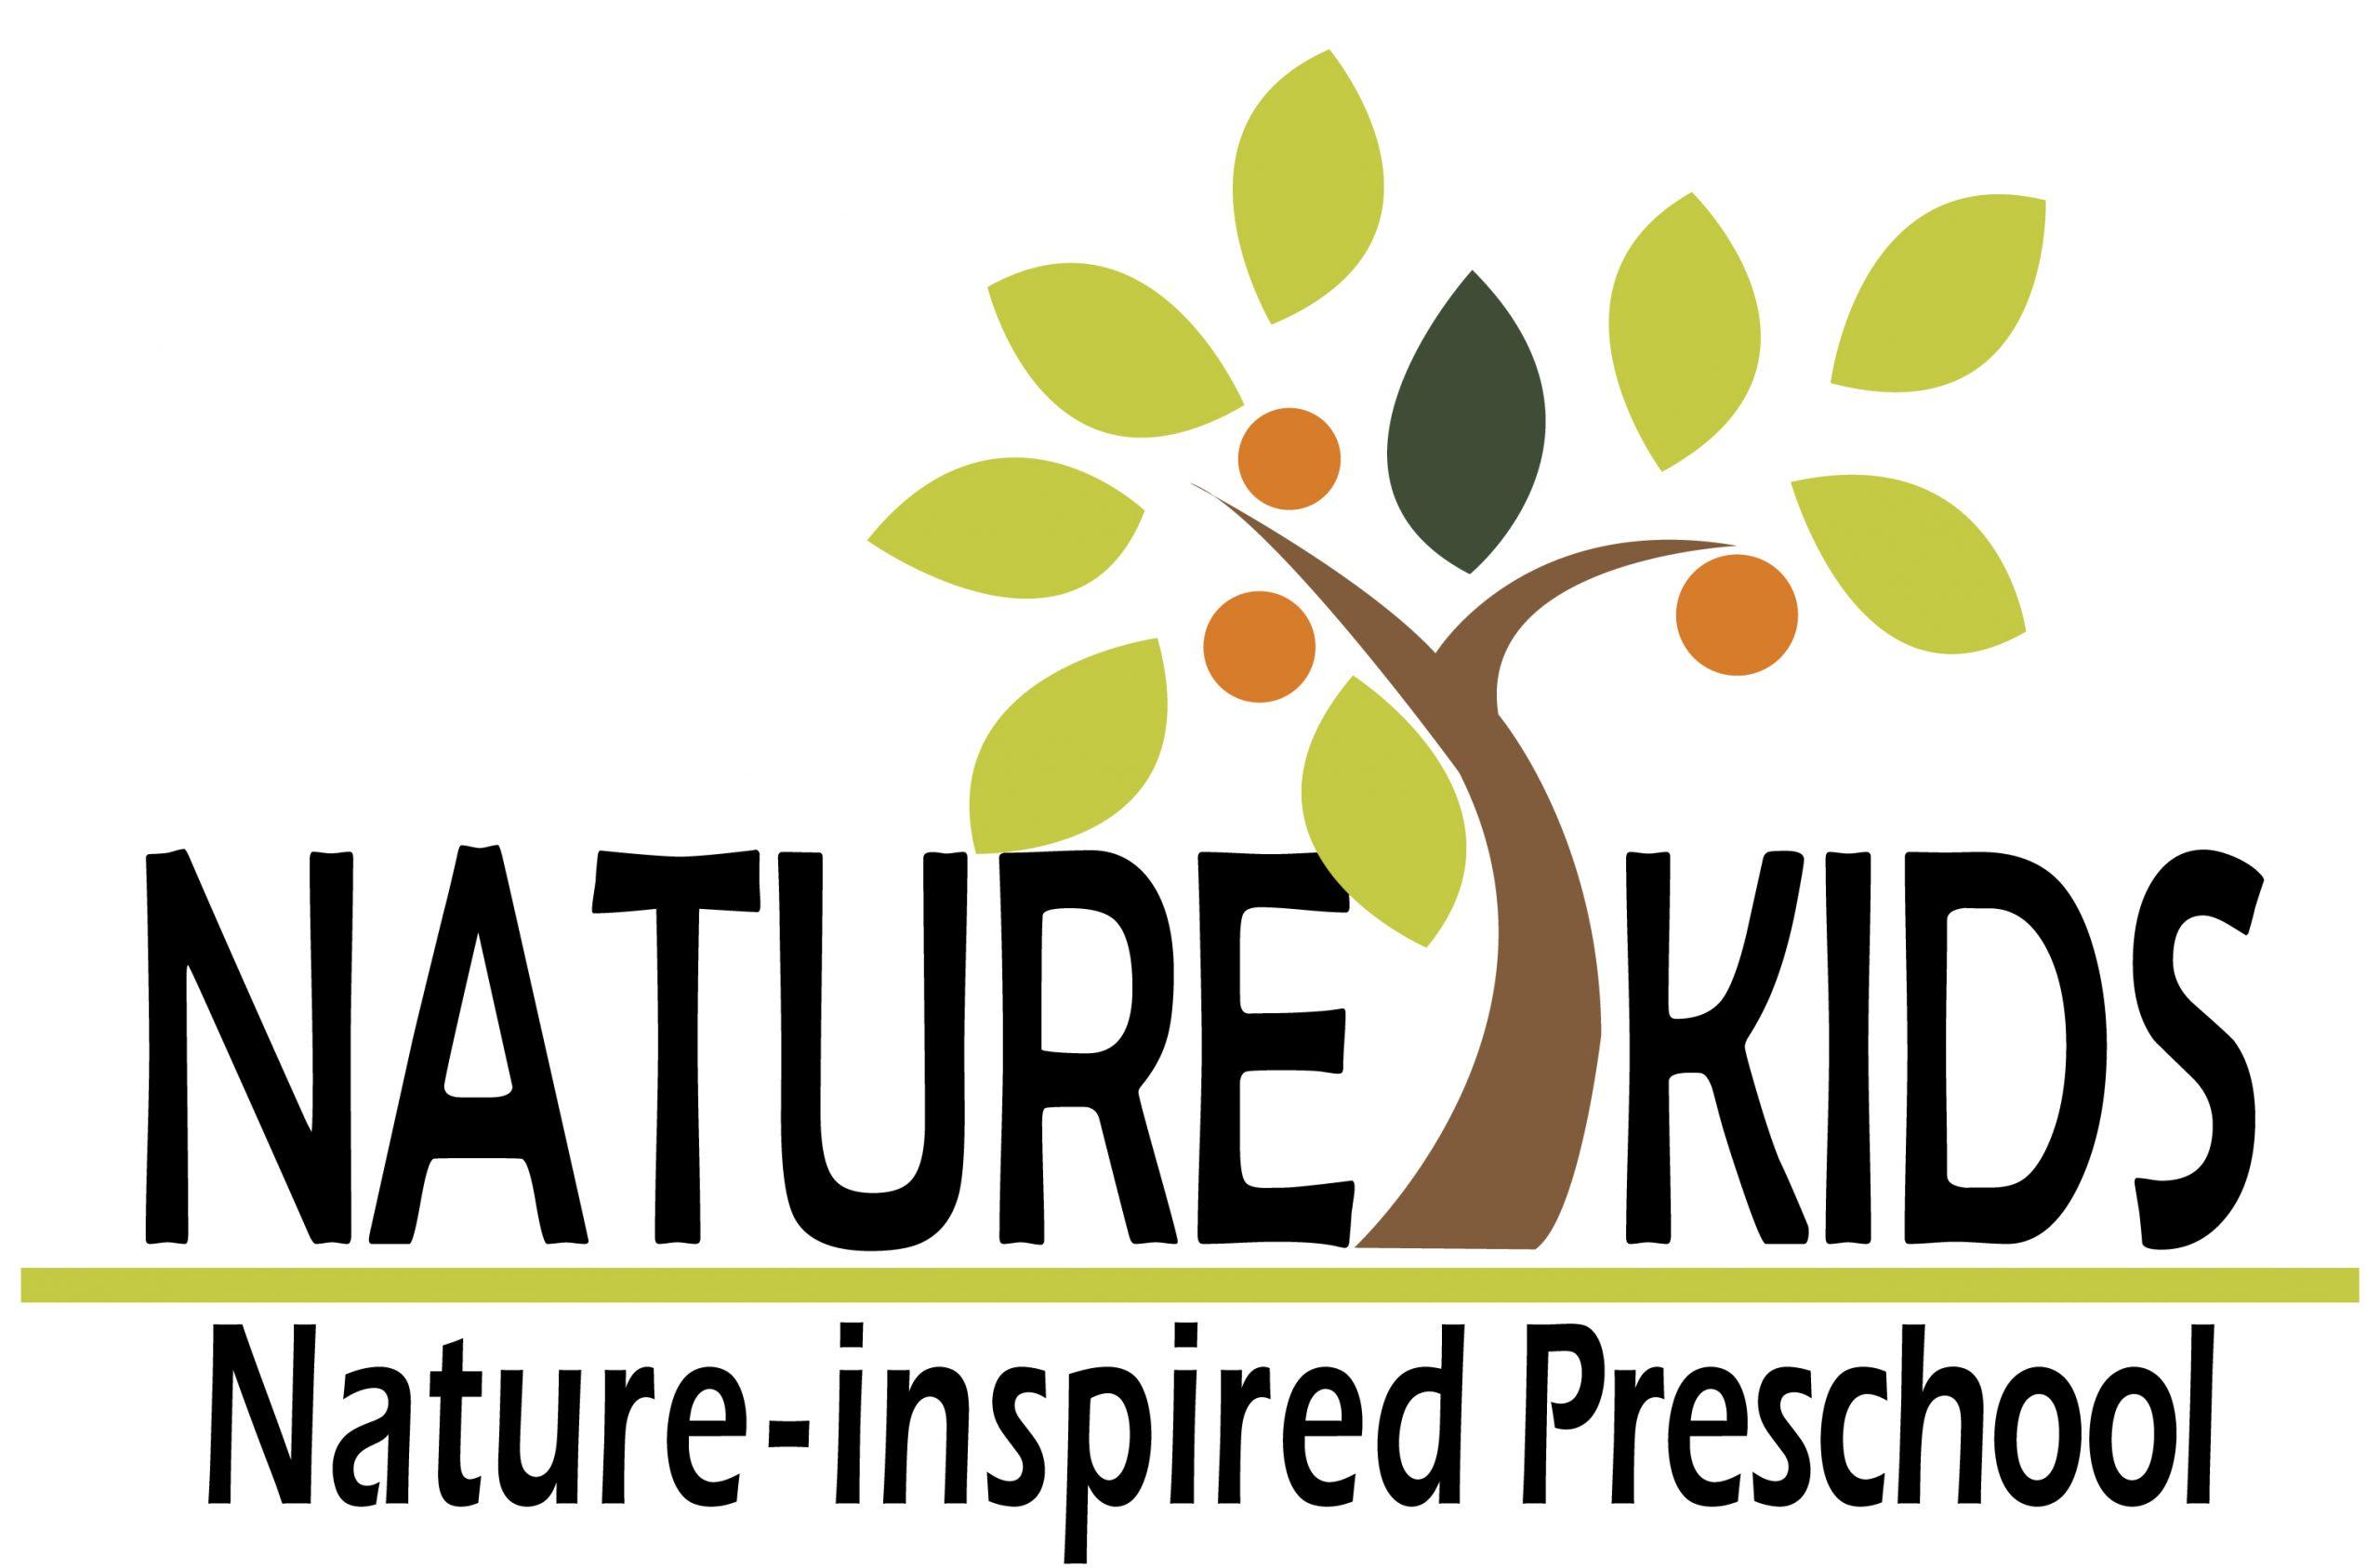 Naturekids